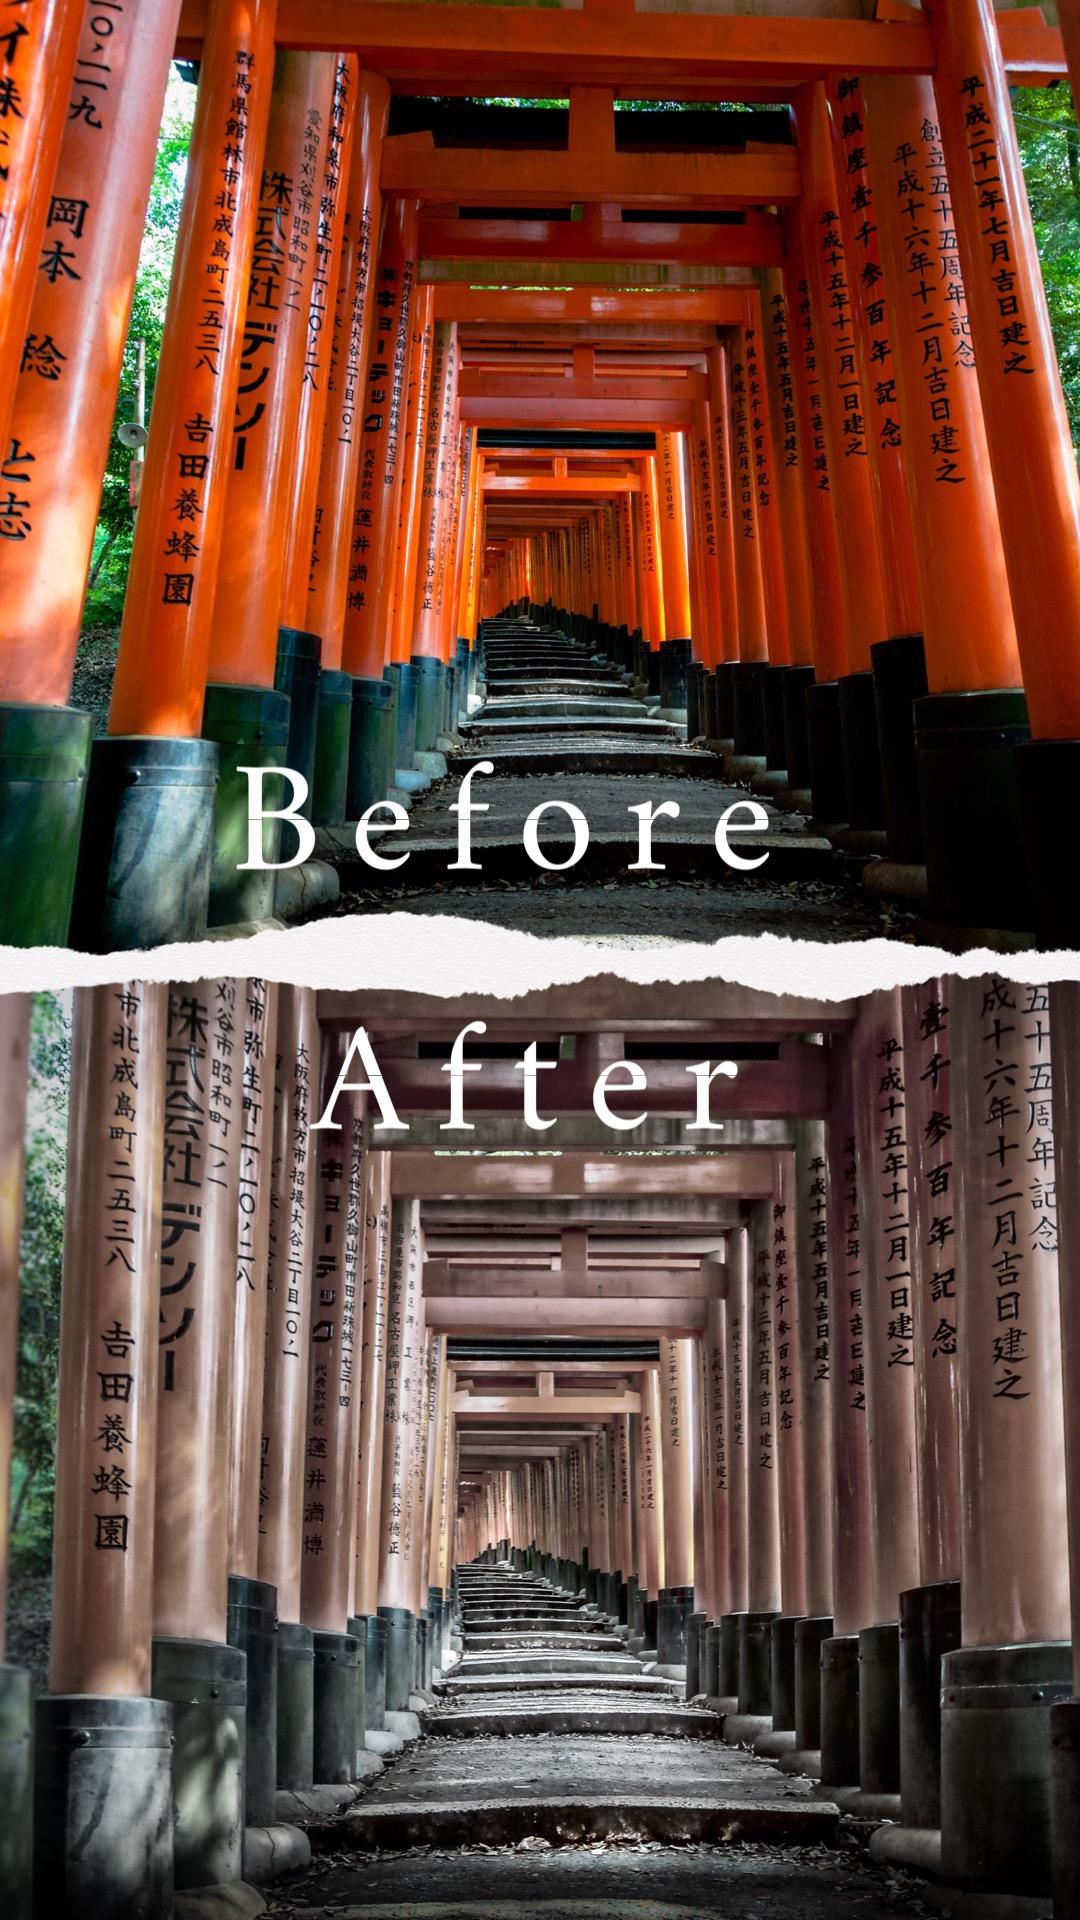 Before & After : Japan - Tokyo